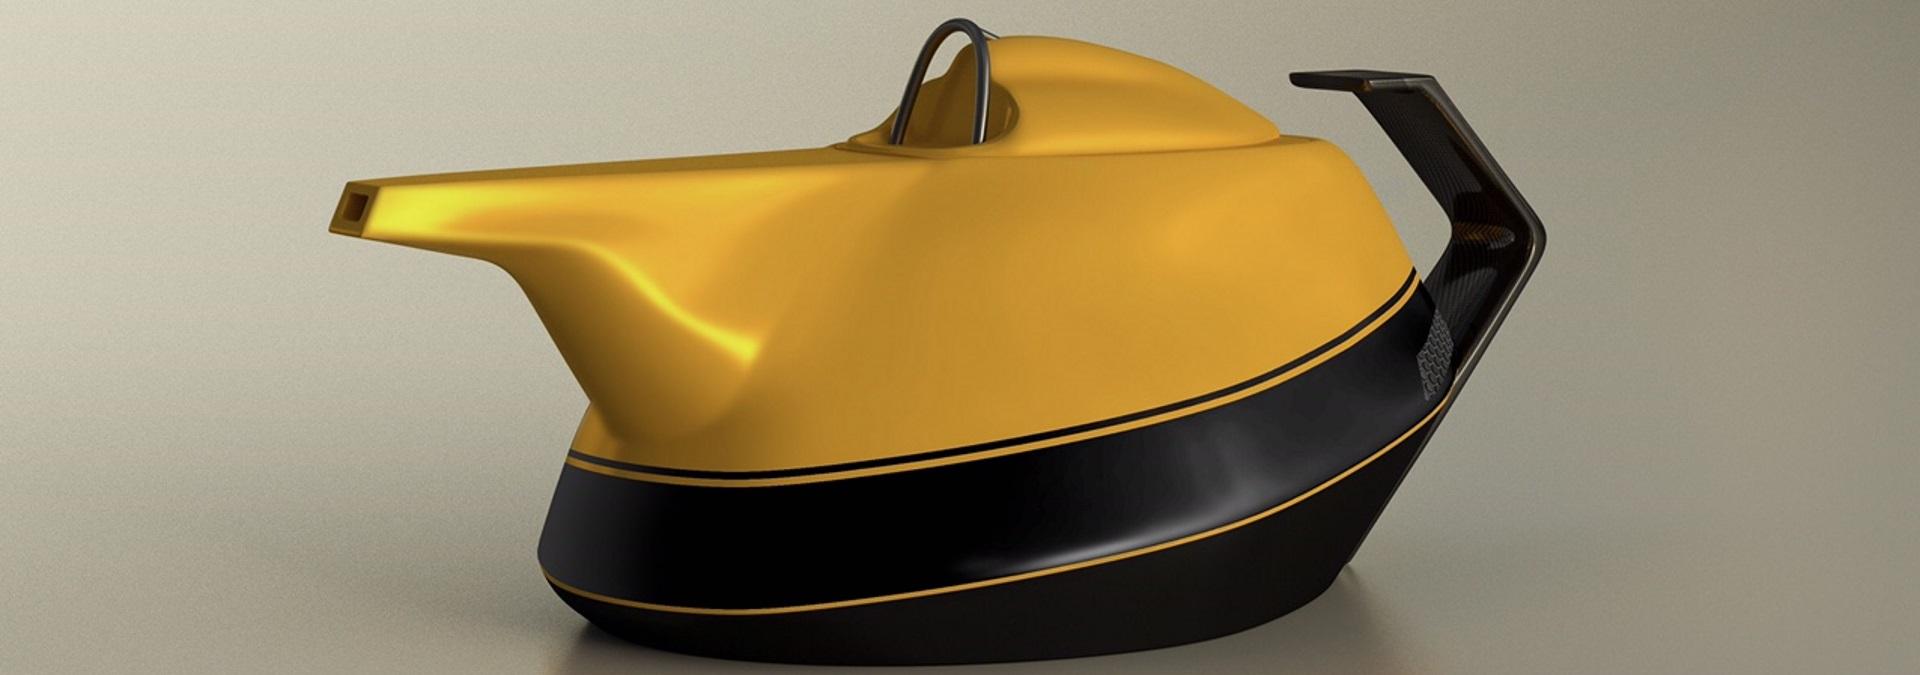 Yellow Teapot_1920